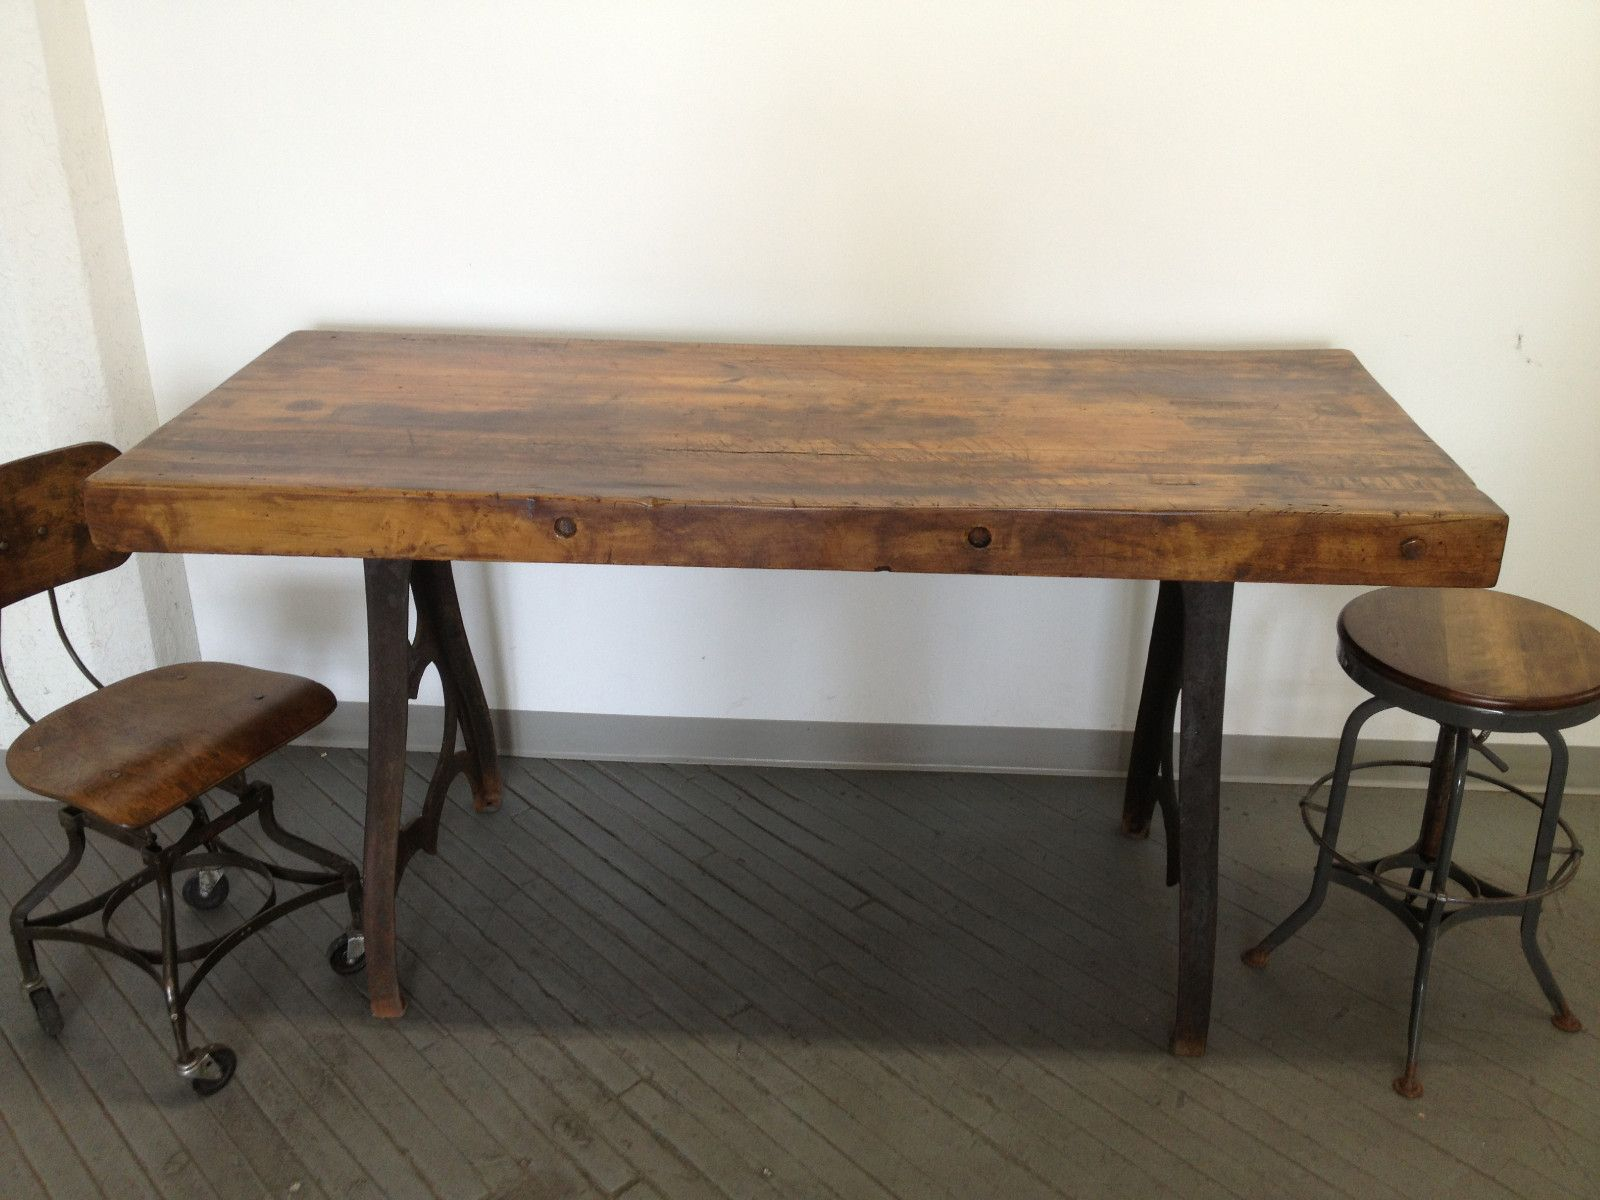 butcher block kitchen table Vintage Industrial Dining Table Cast Iron Bakers Butcher Block Factory 6 Desk